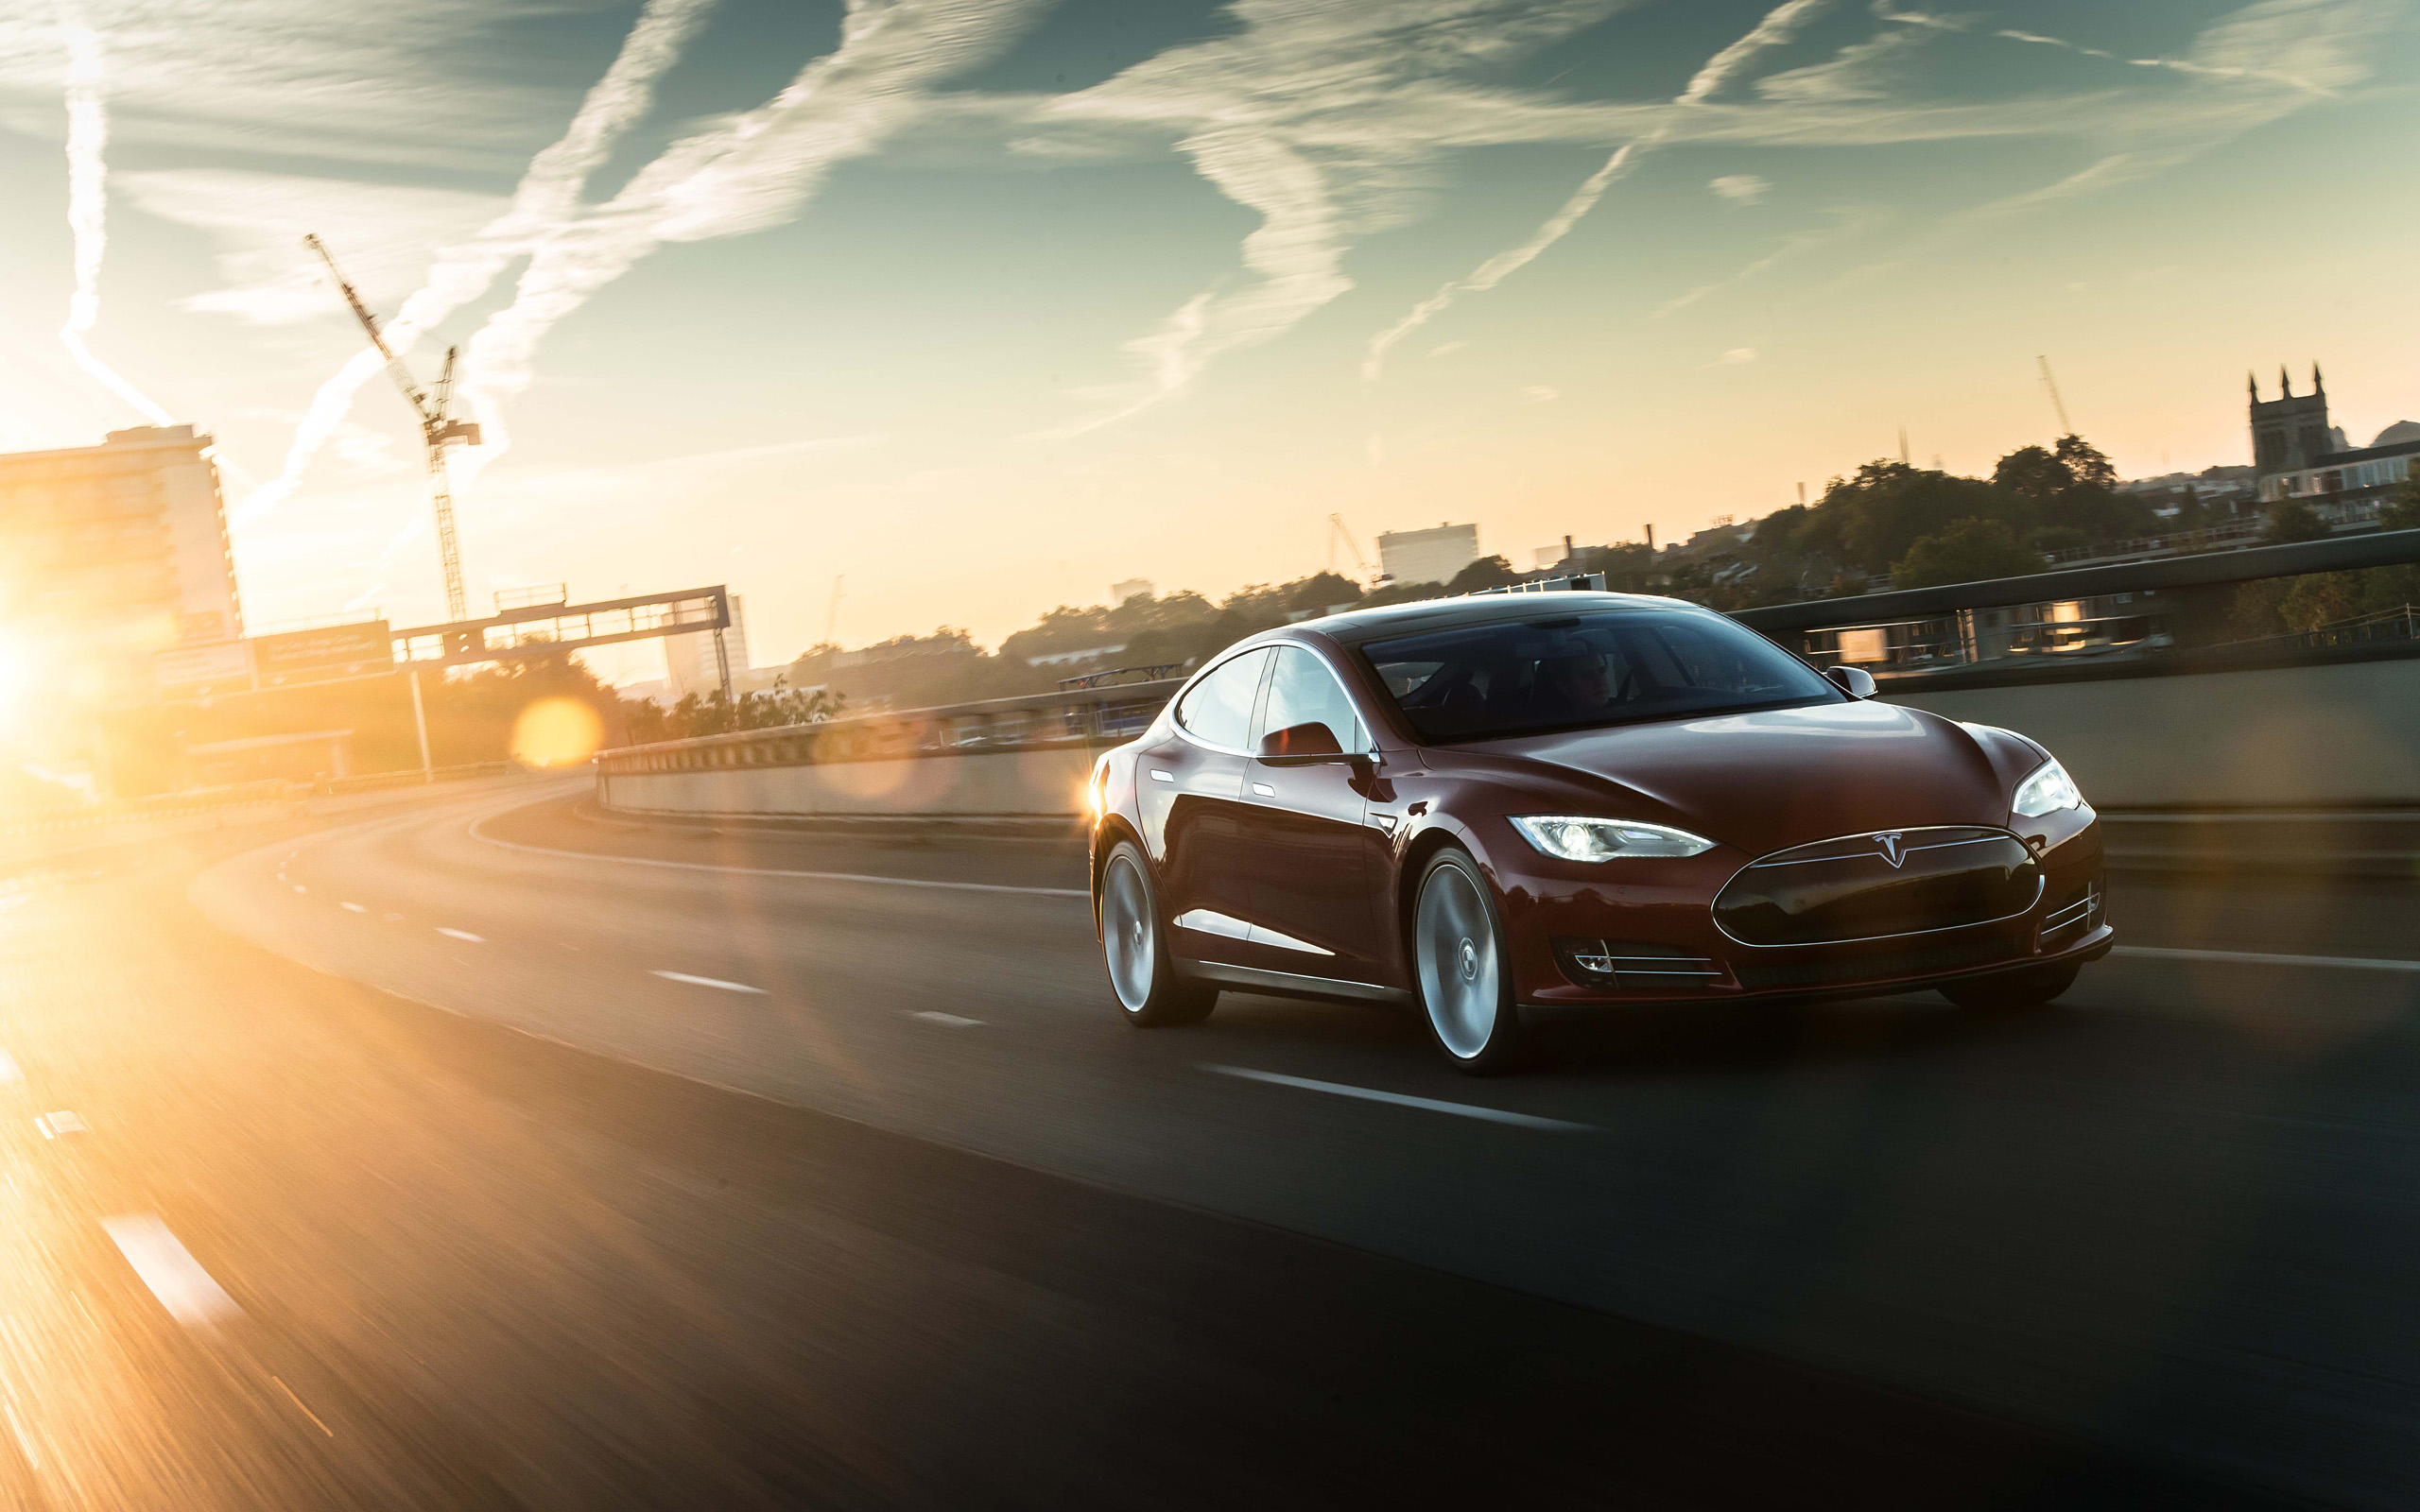 2014 Tesla Model S supercar d wallpaper background 2560x1600